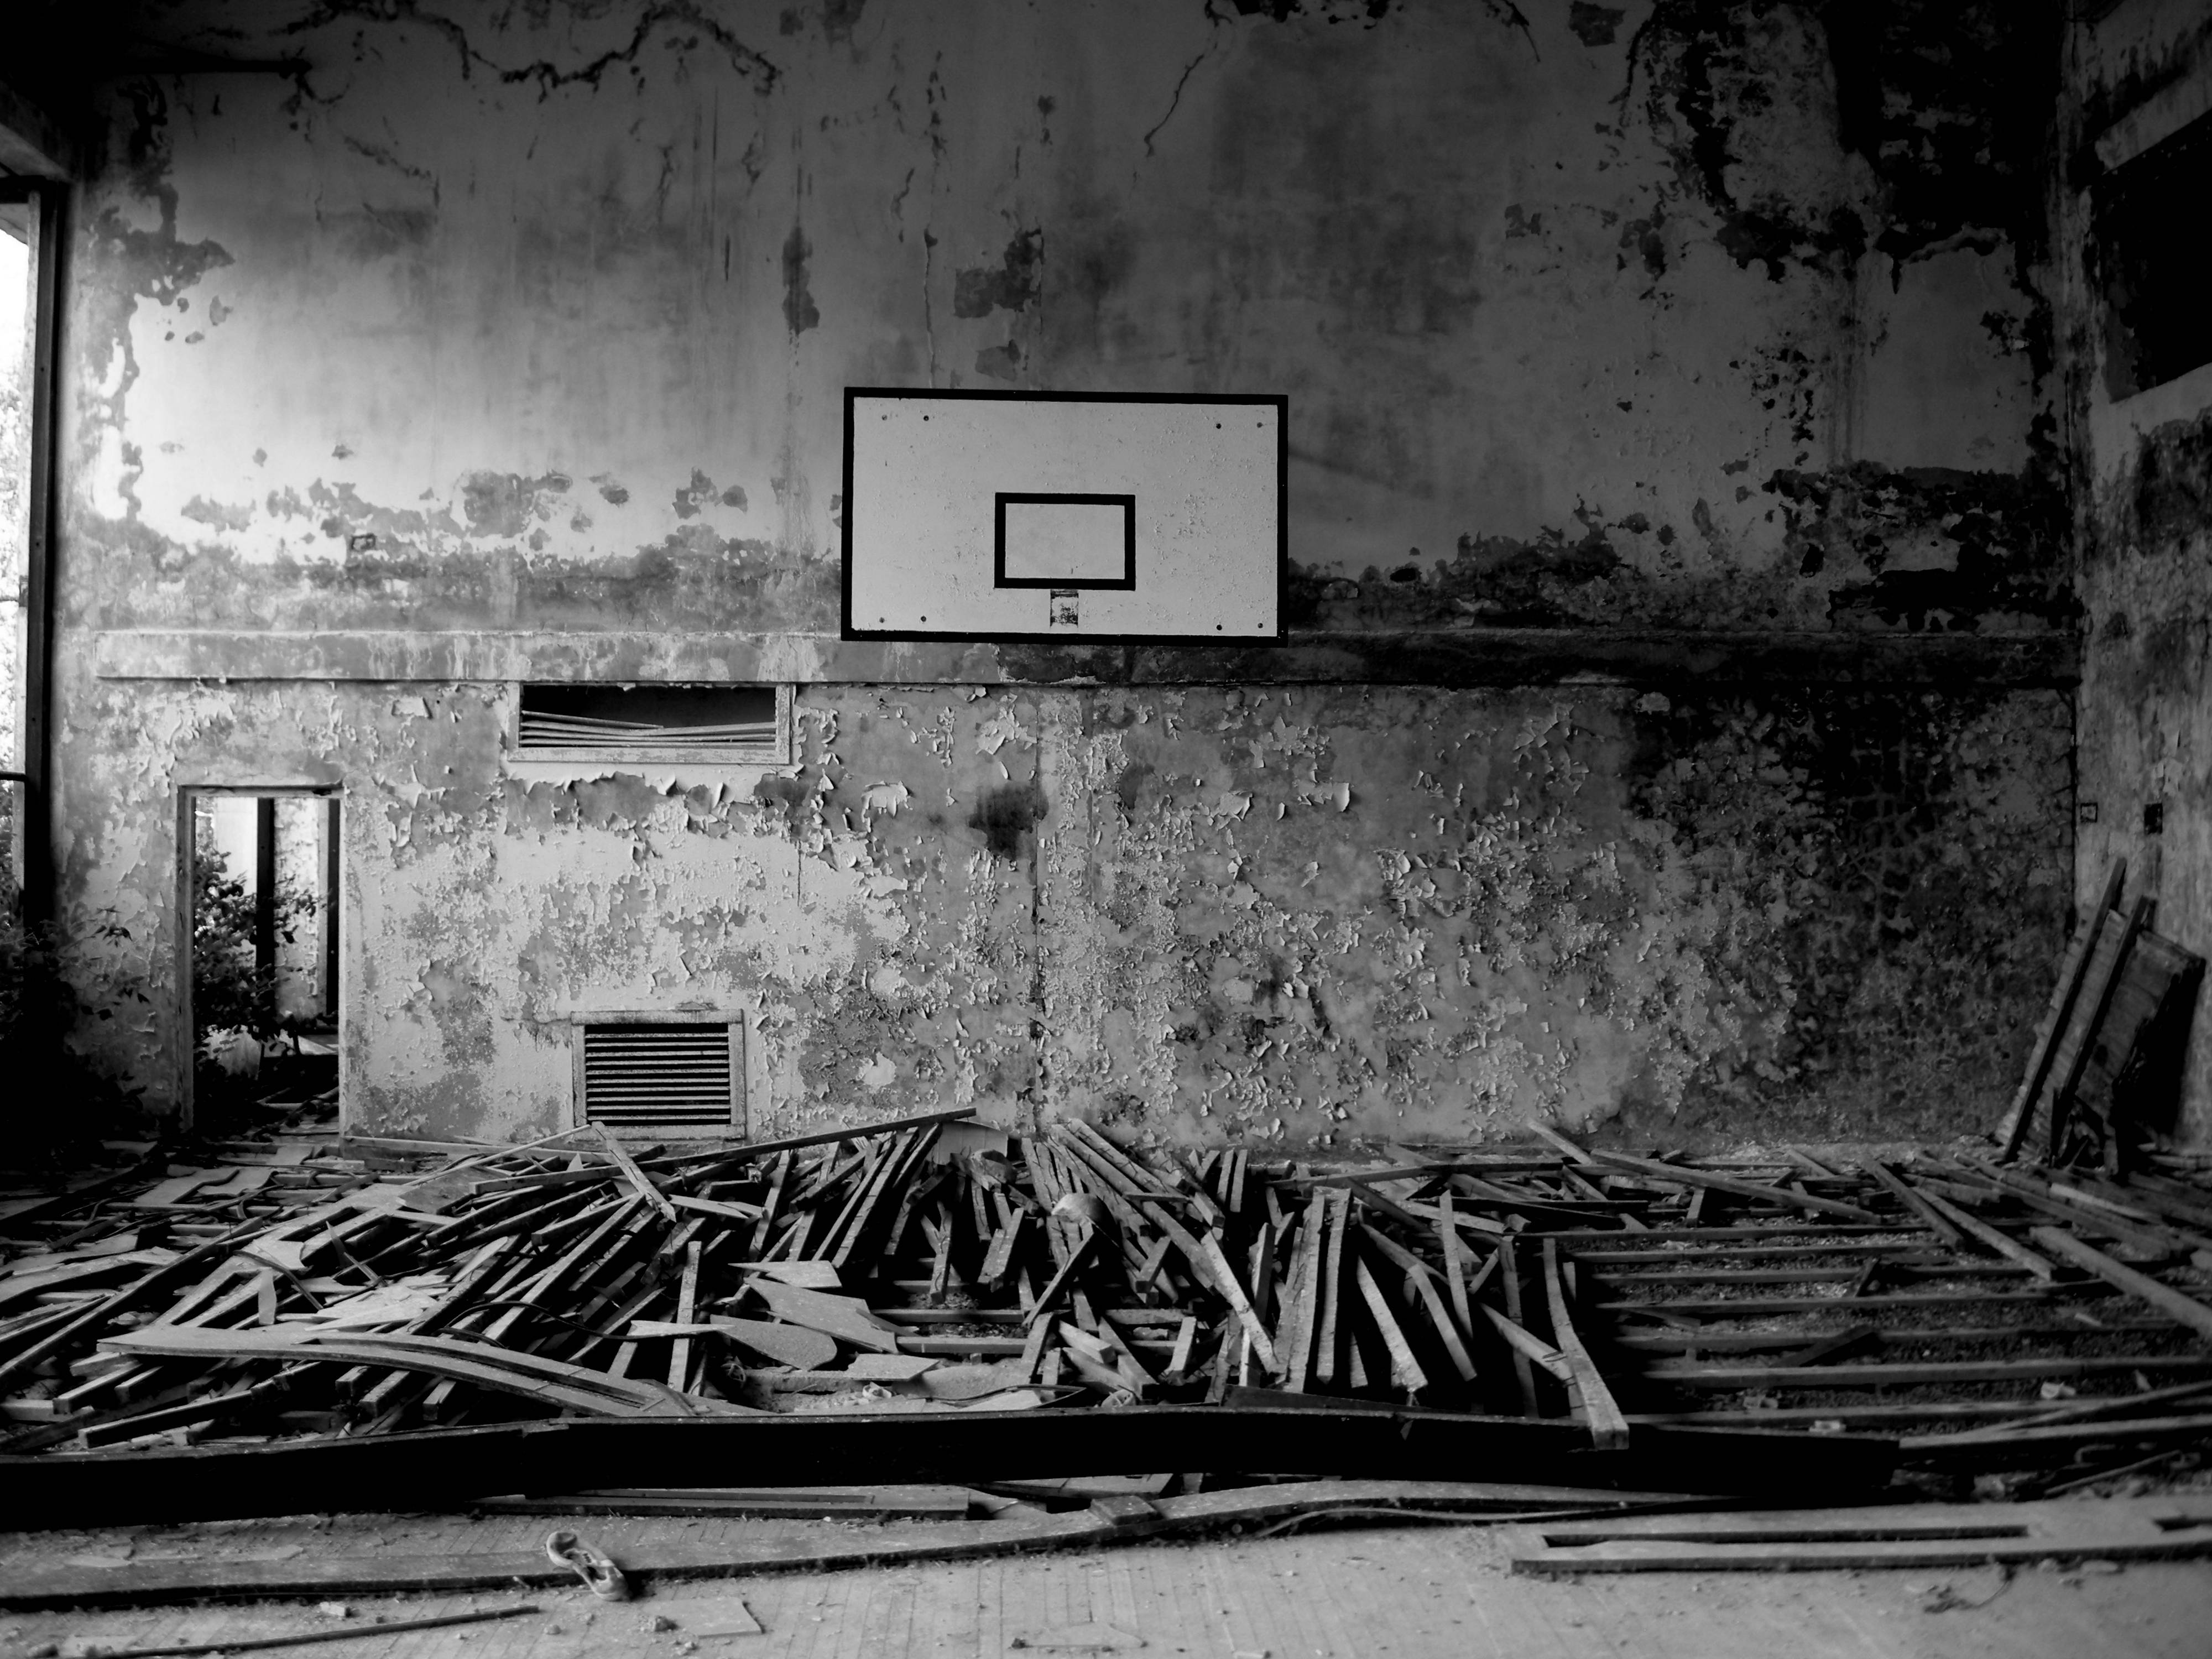 Basketball Court Wallpapers - Wallpaper Cave